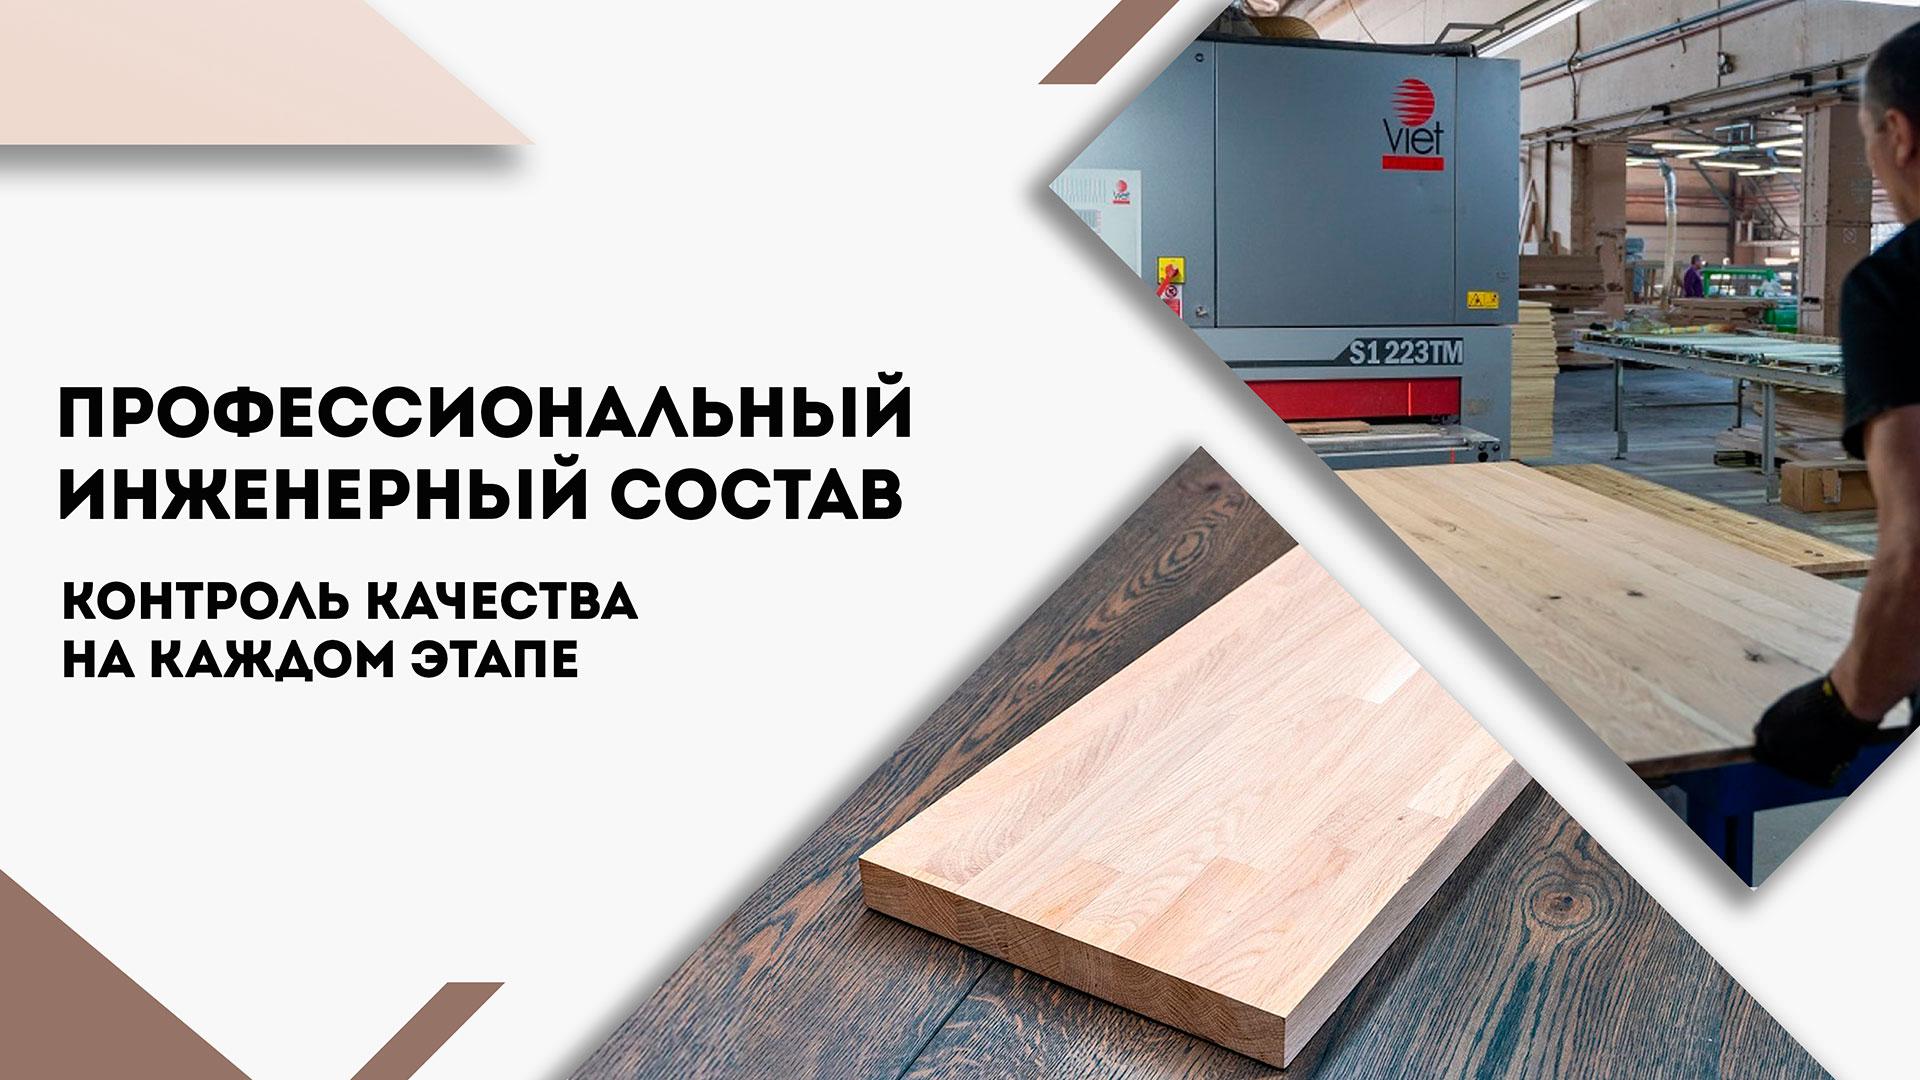 proizvodstvo-mebelm-banner-5